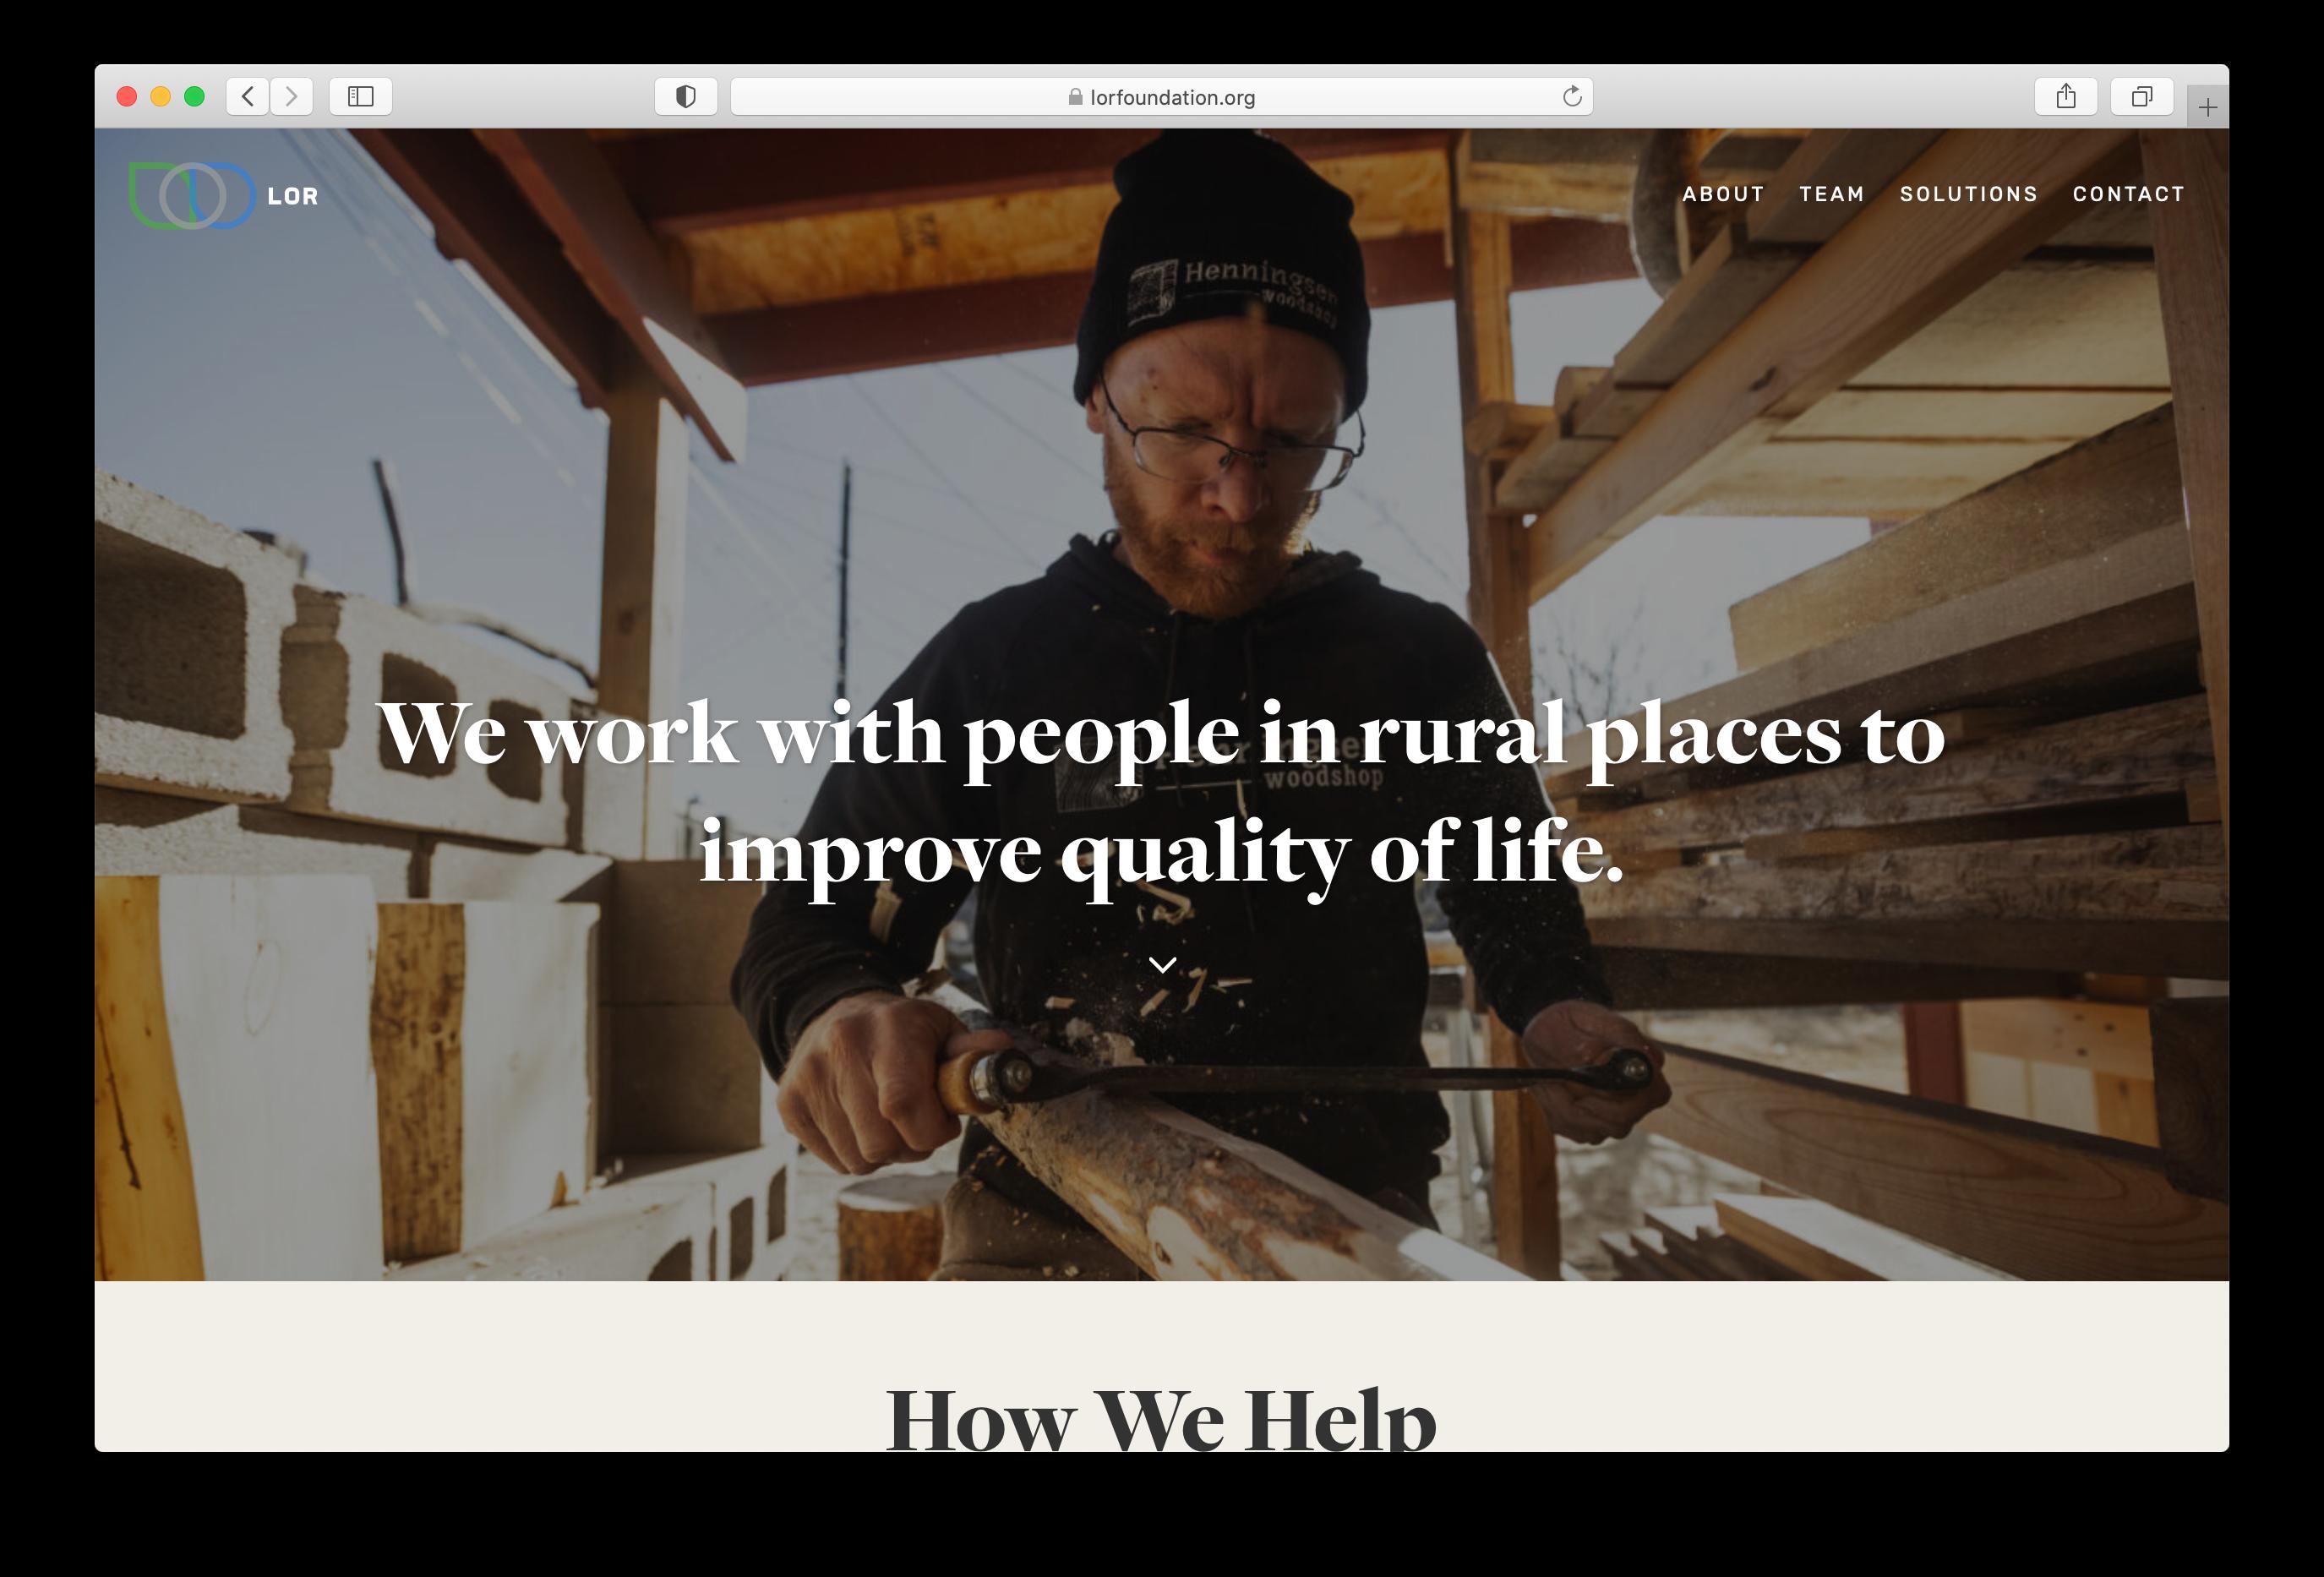 Craig Okraskas photograph of a carpenter on the LOR Foundation homepage